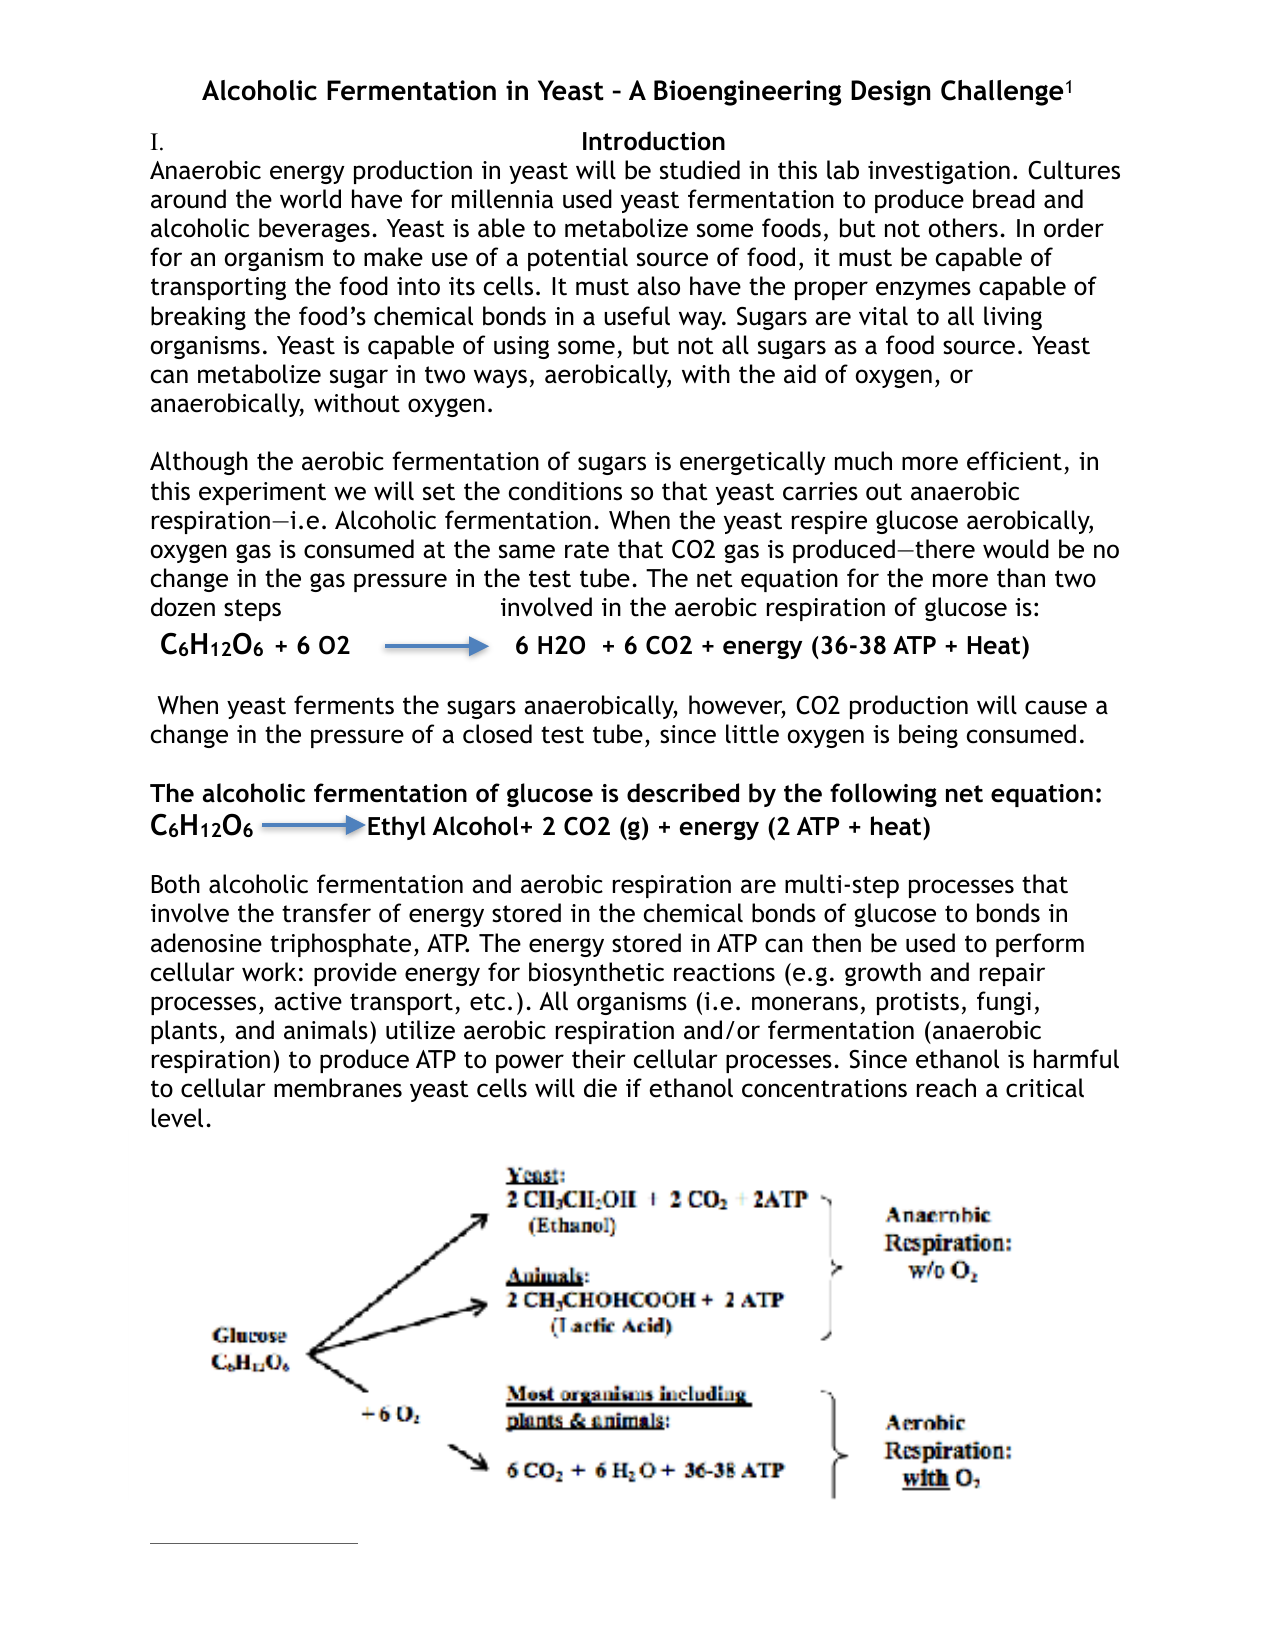 background information on yeast fermentation